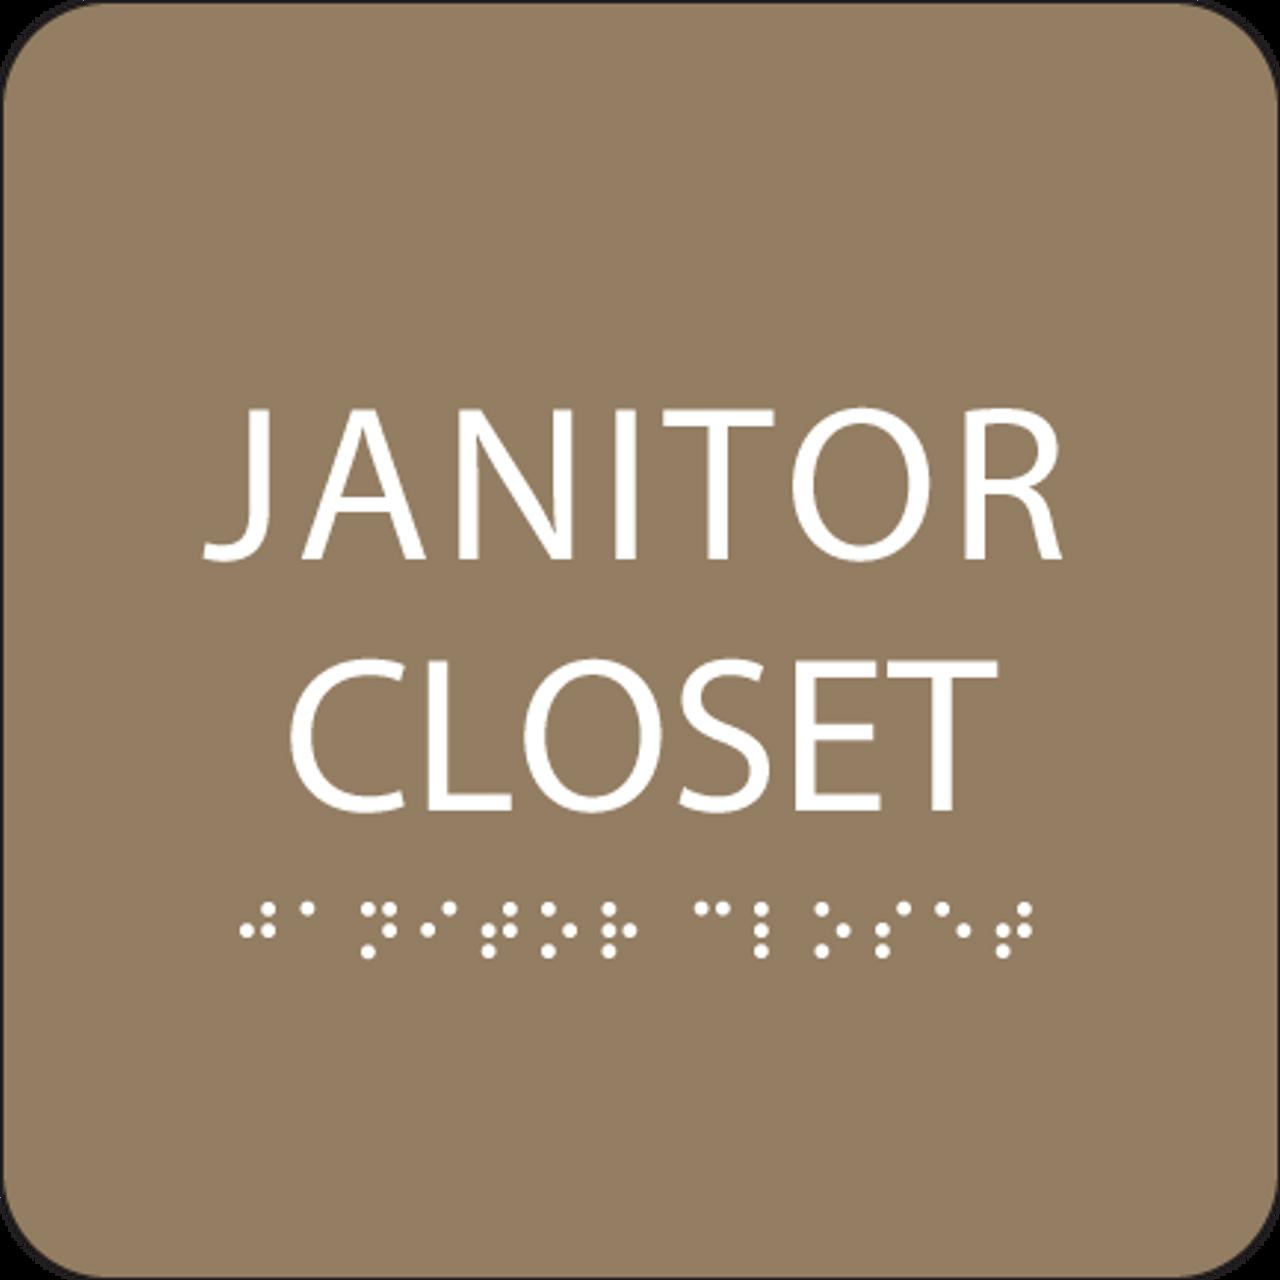 Brown Janitor Closet Tactile Sign